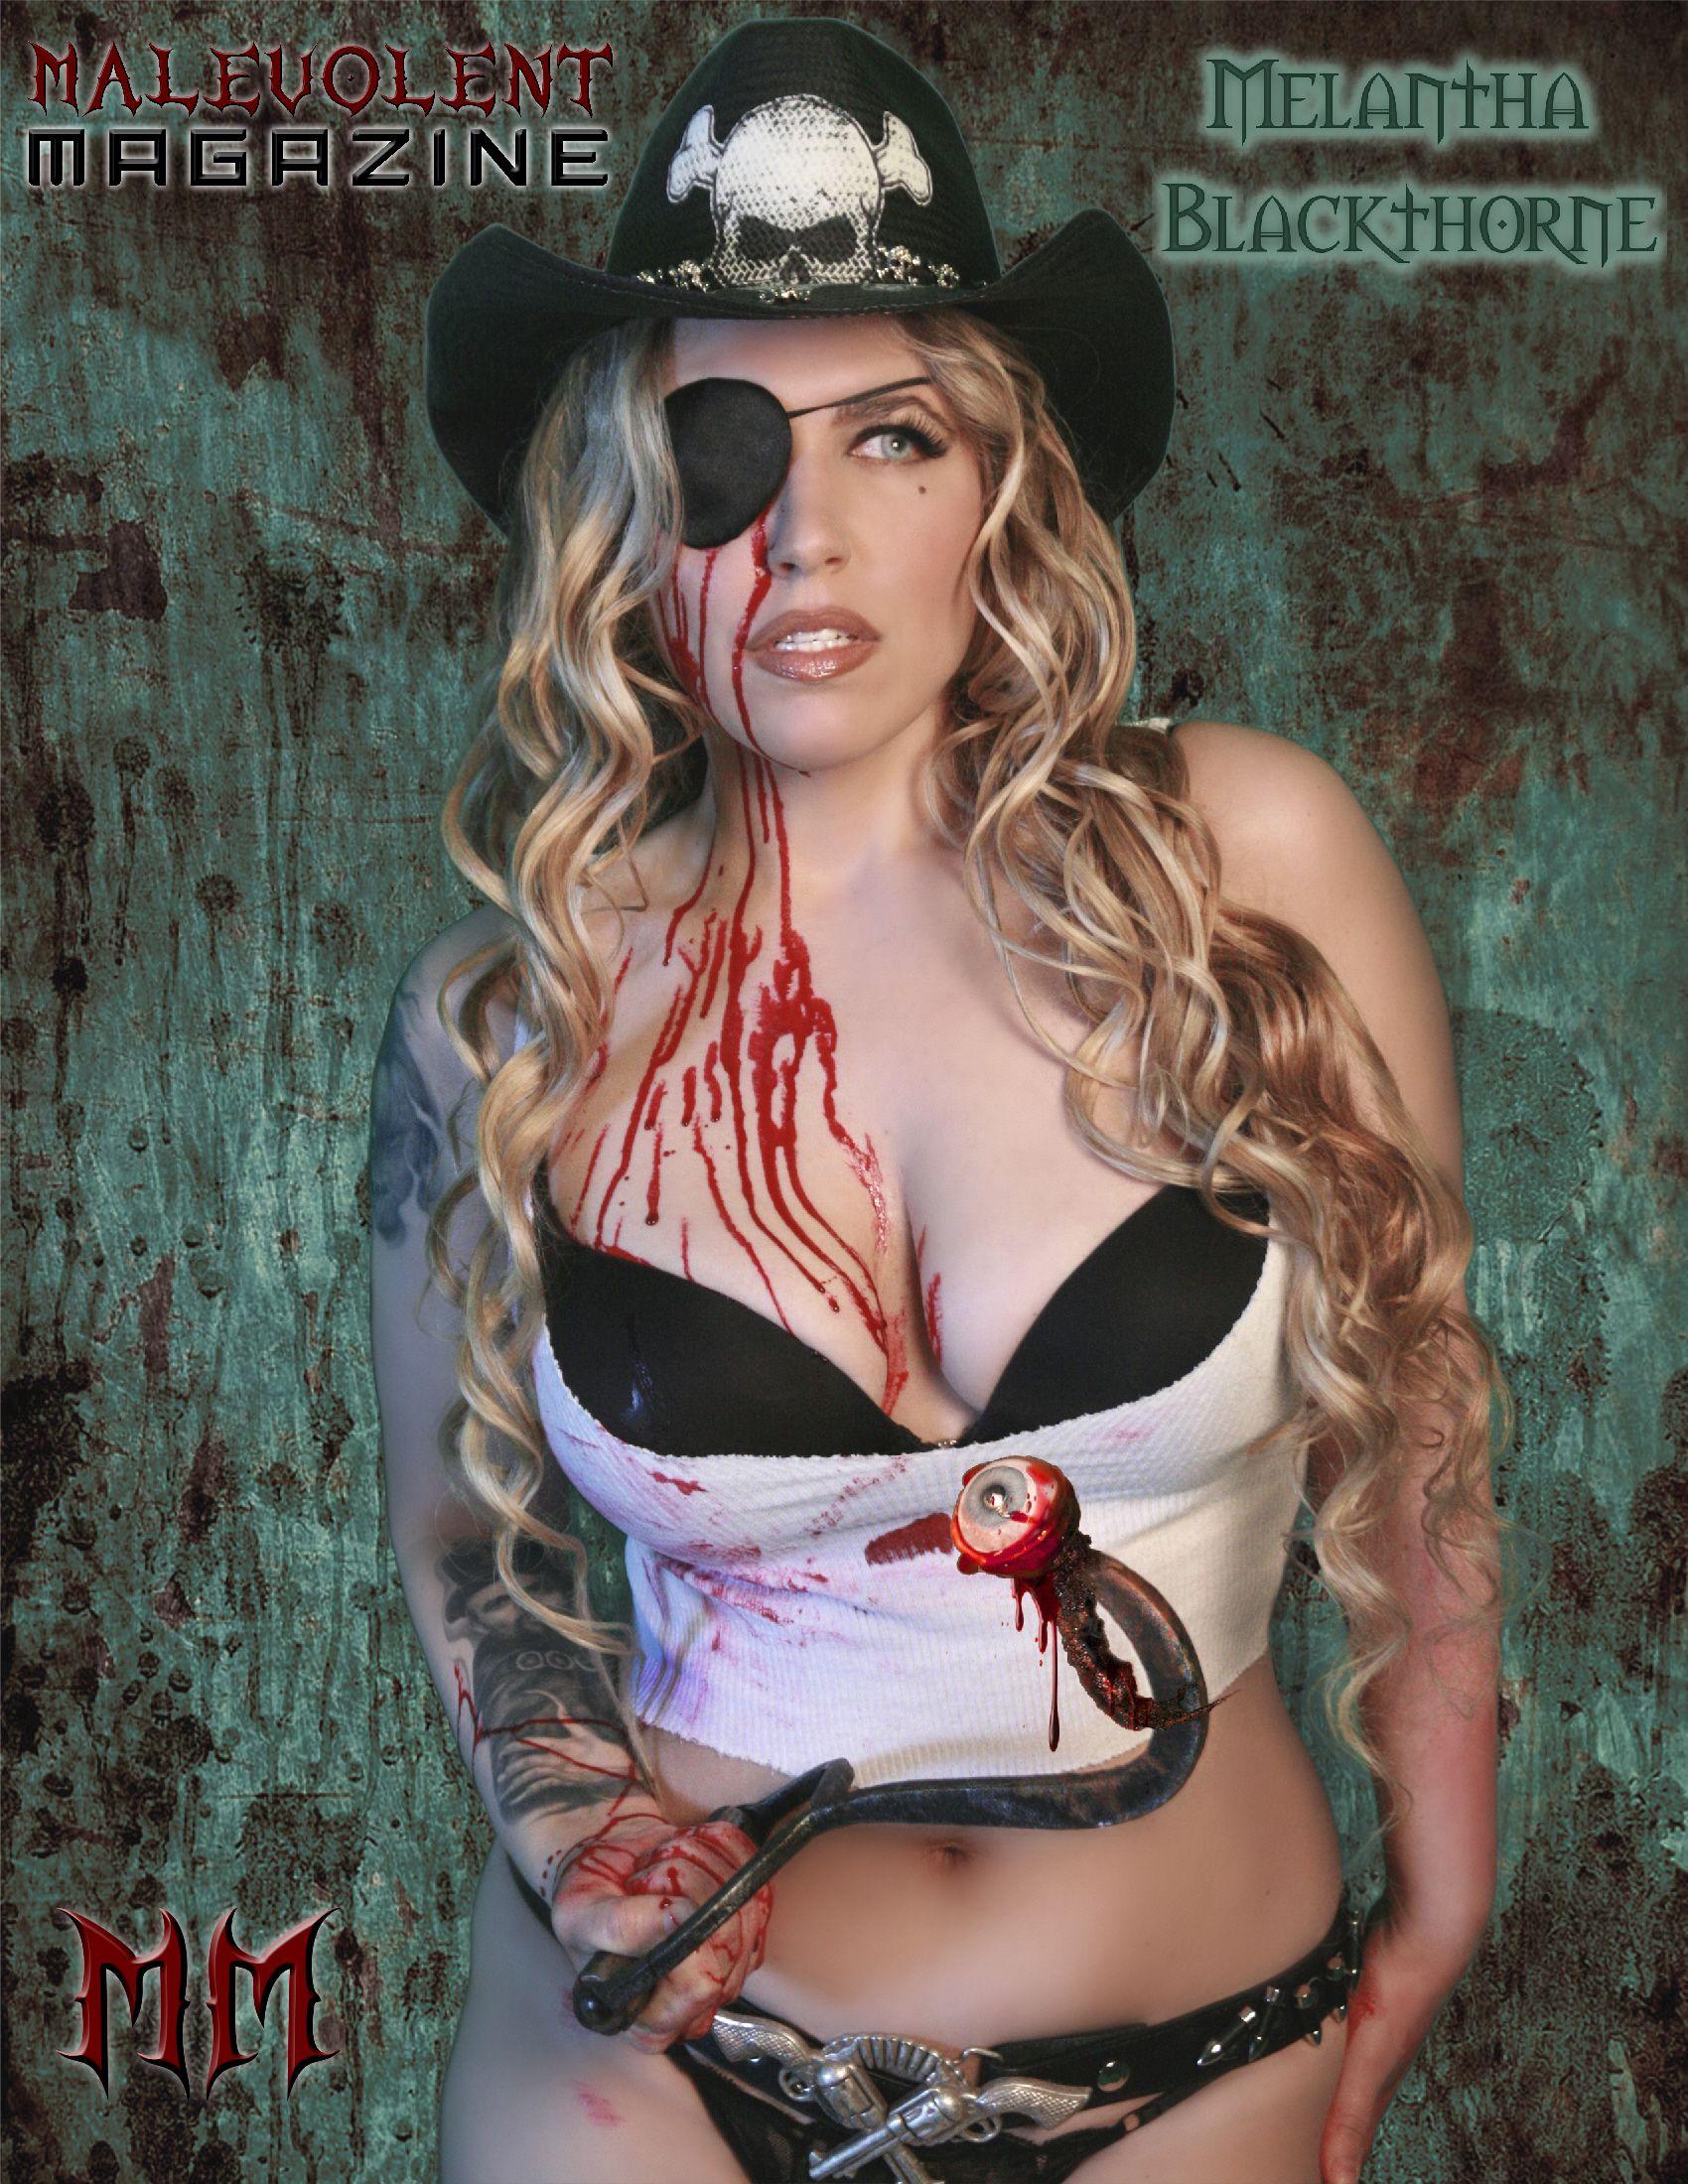 Melantha Blackthorne Nude Photos 69